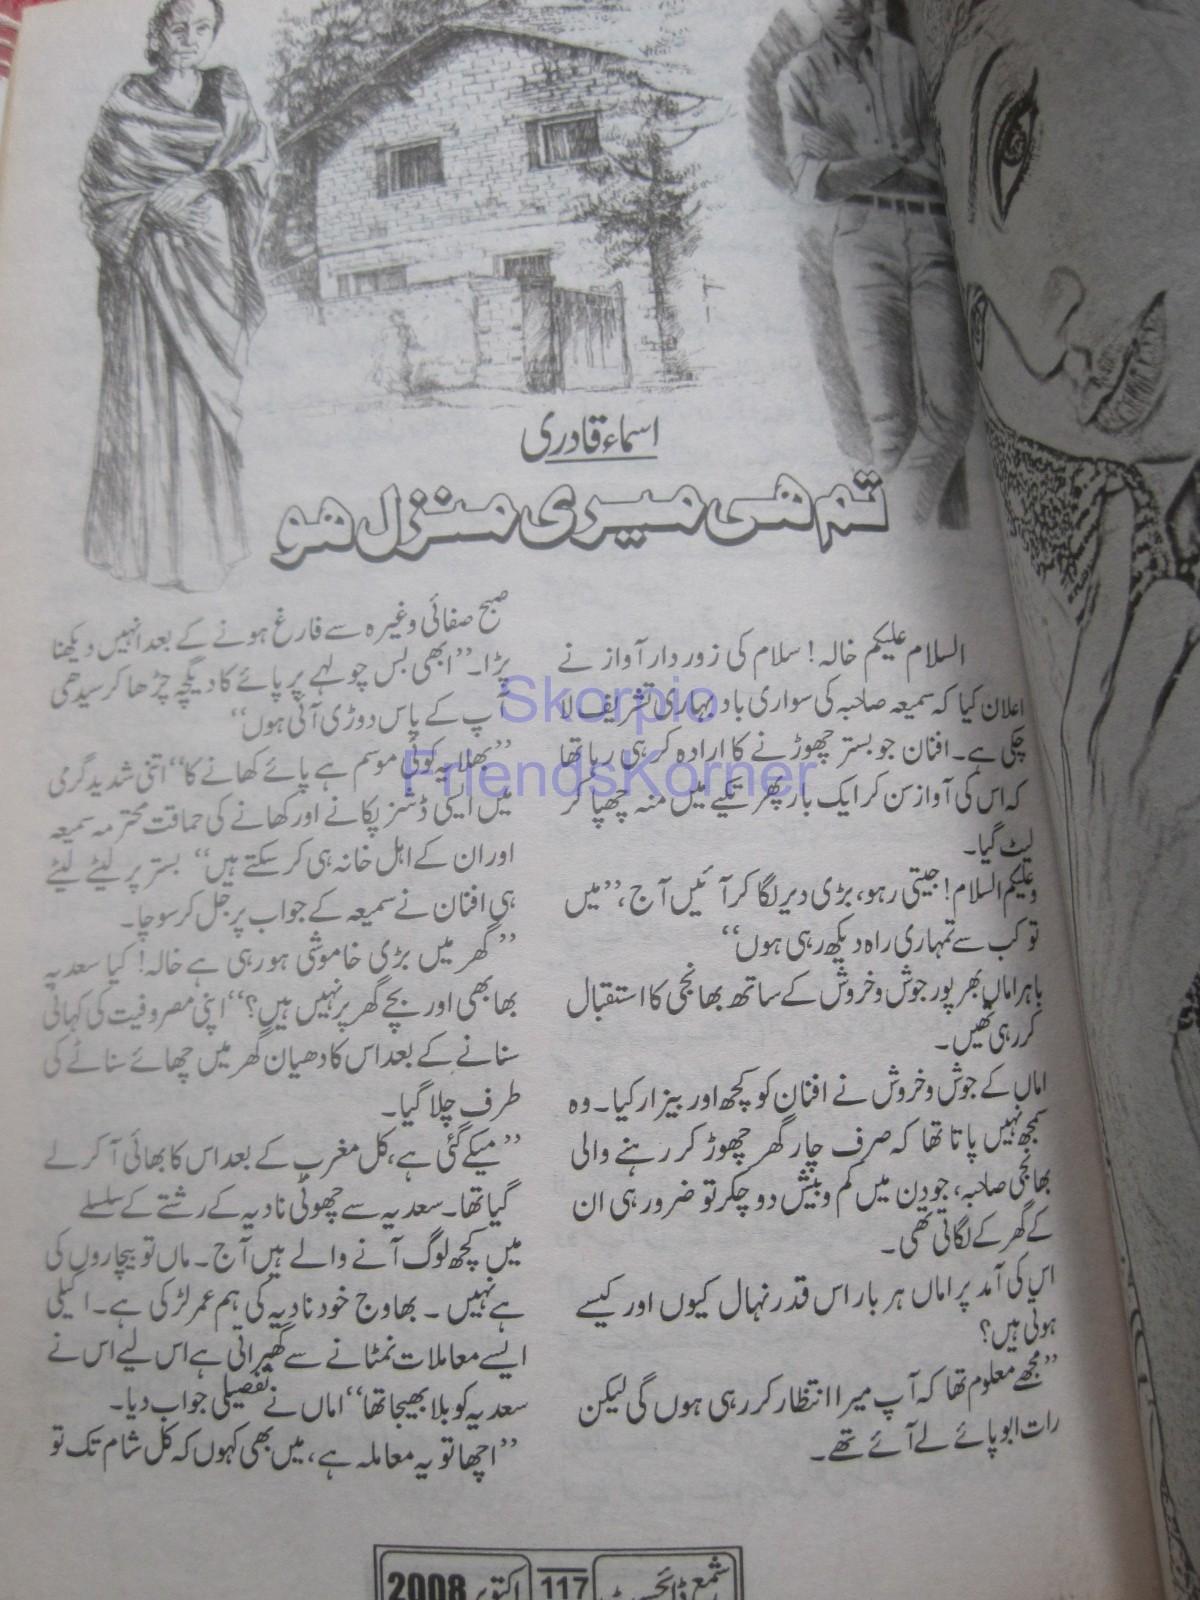 Tum hi meri manzil ho novel by asma Qadri pdf